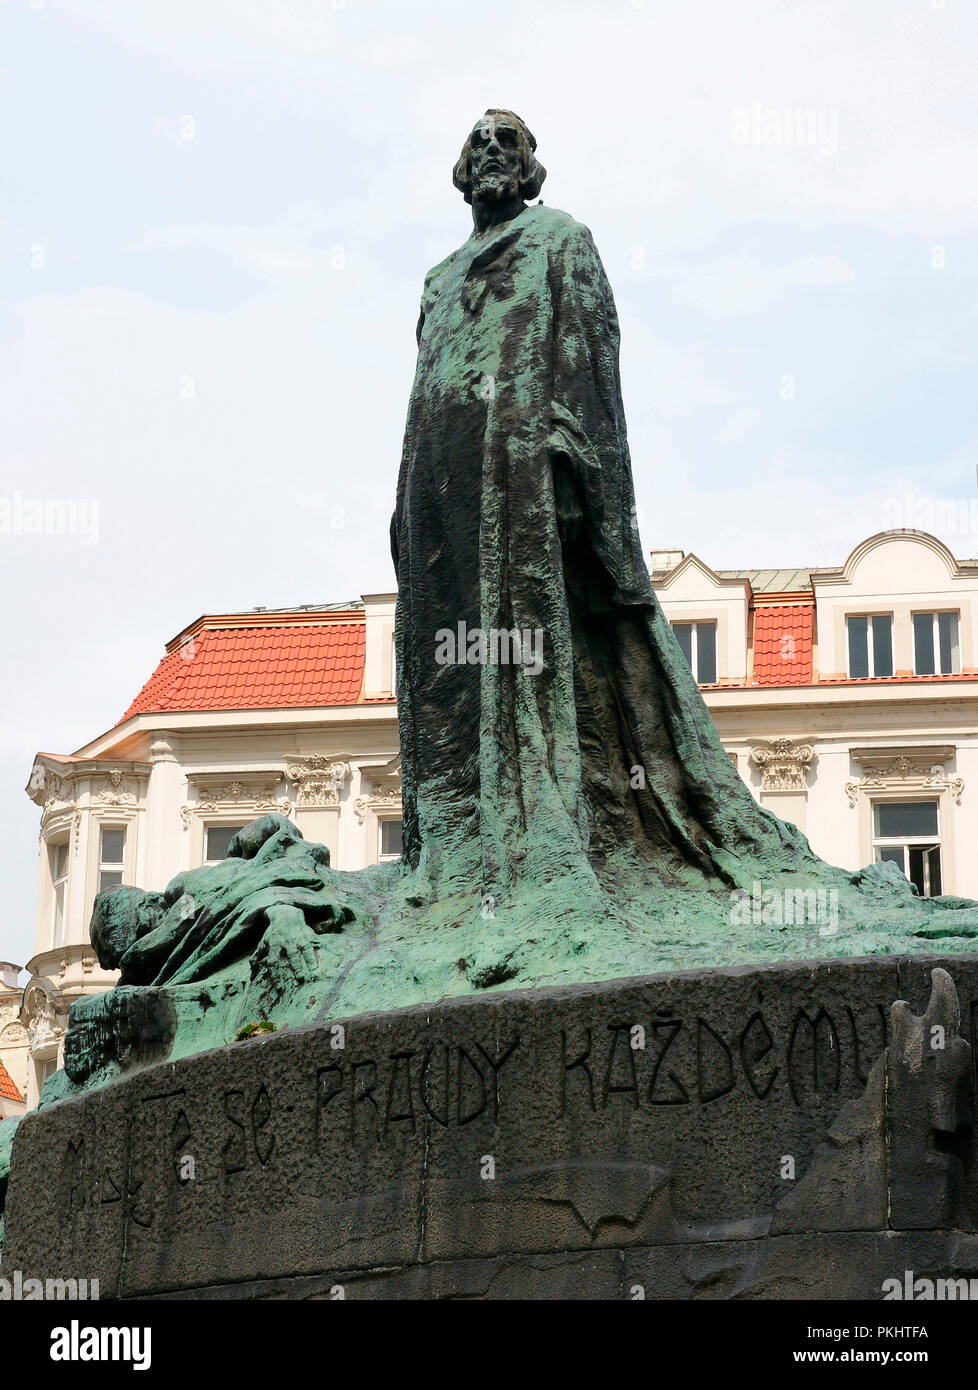 Czech Republic. Prague.  Old Town Square. Jan Hus Memorial, reformer and redecessor to Protestatism (1369-1415). Sculptural group designed by Ladislav Saloun (1870-1946), 1901-1915. Detail. Art Nouveau period. - Stock Image